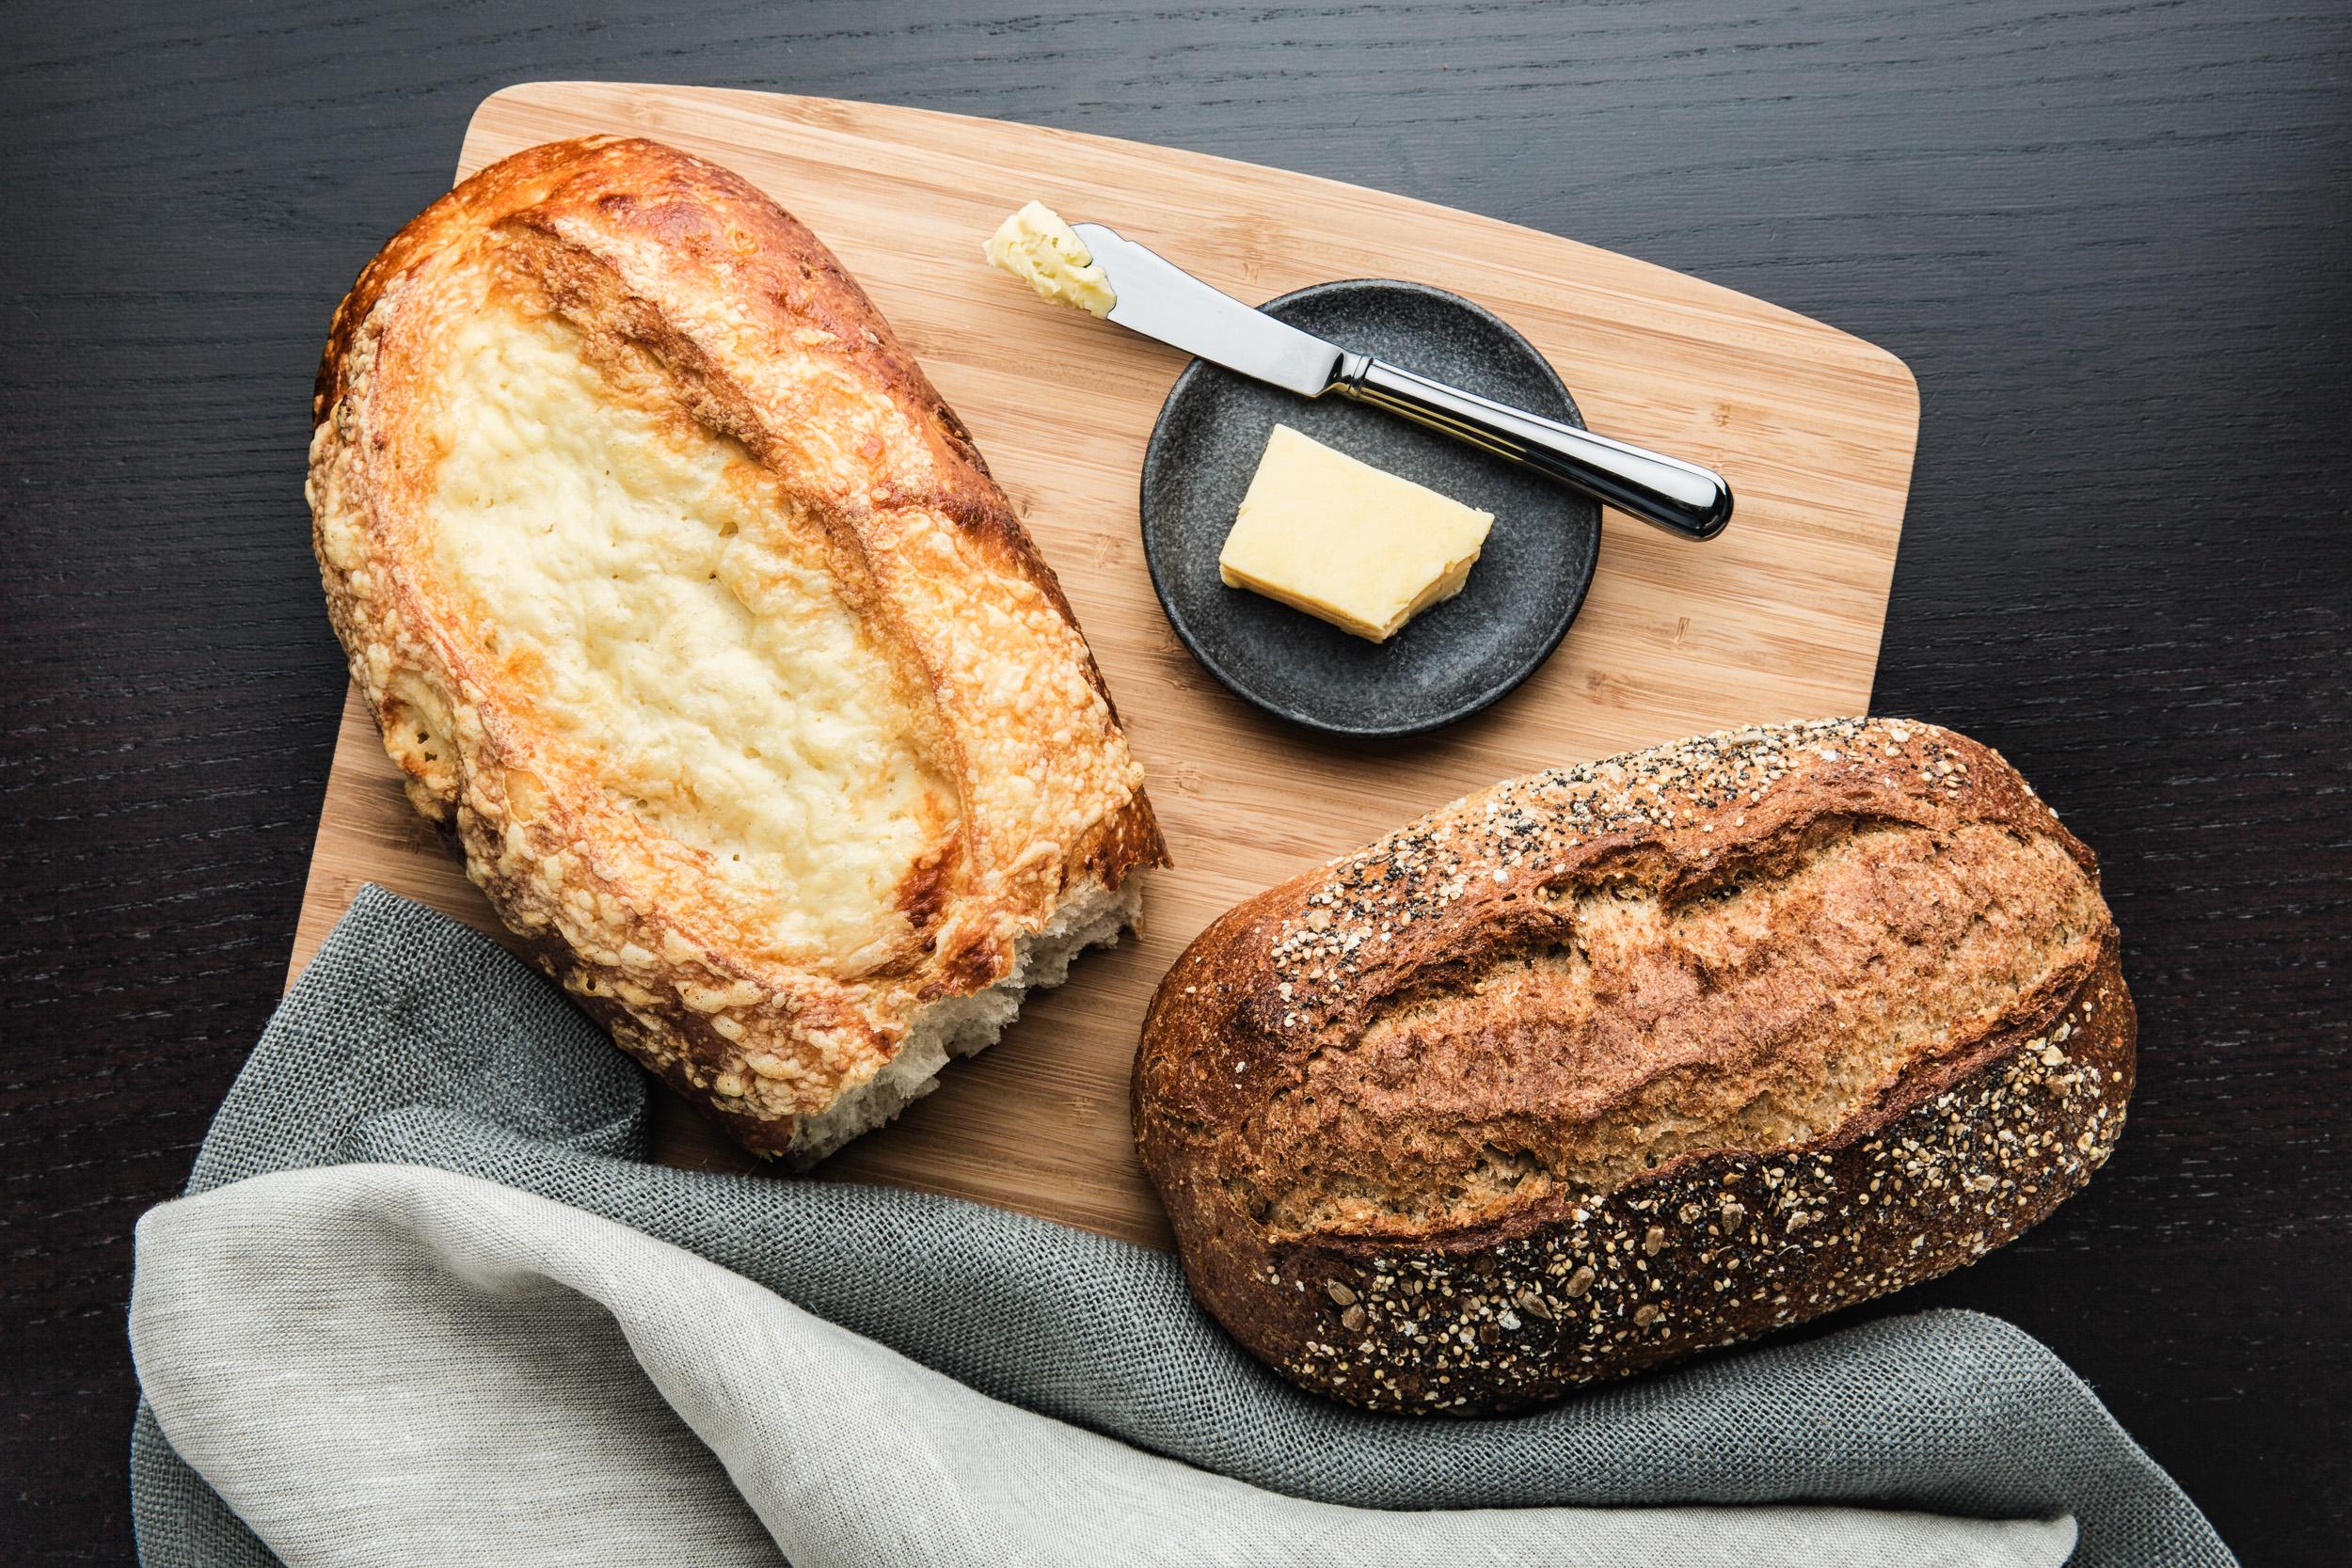 Miami_Fort_Lauderdale_food_photographer_bread_butter_Franklin Castillo.jpg